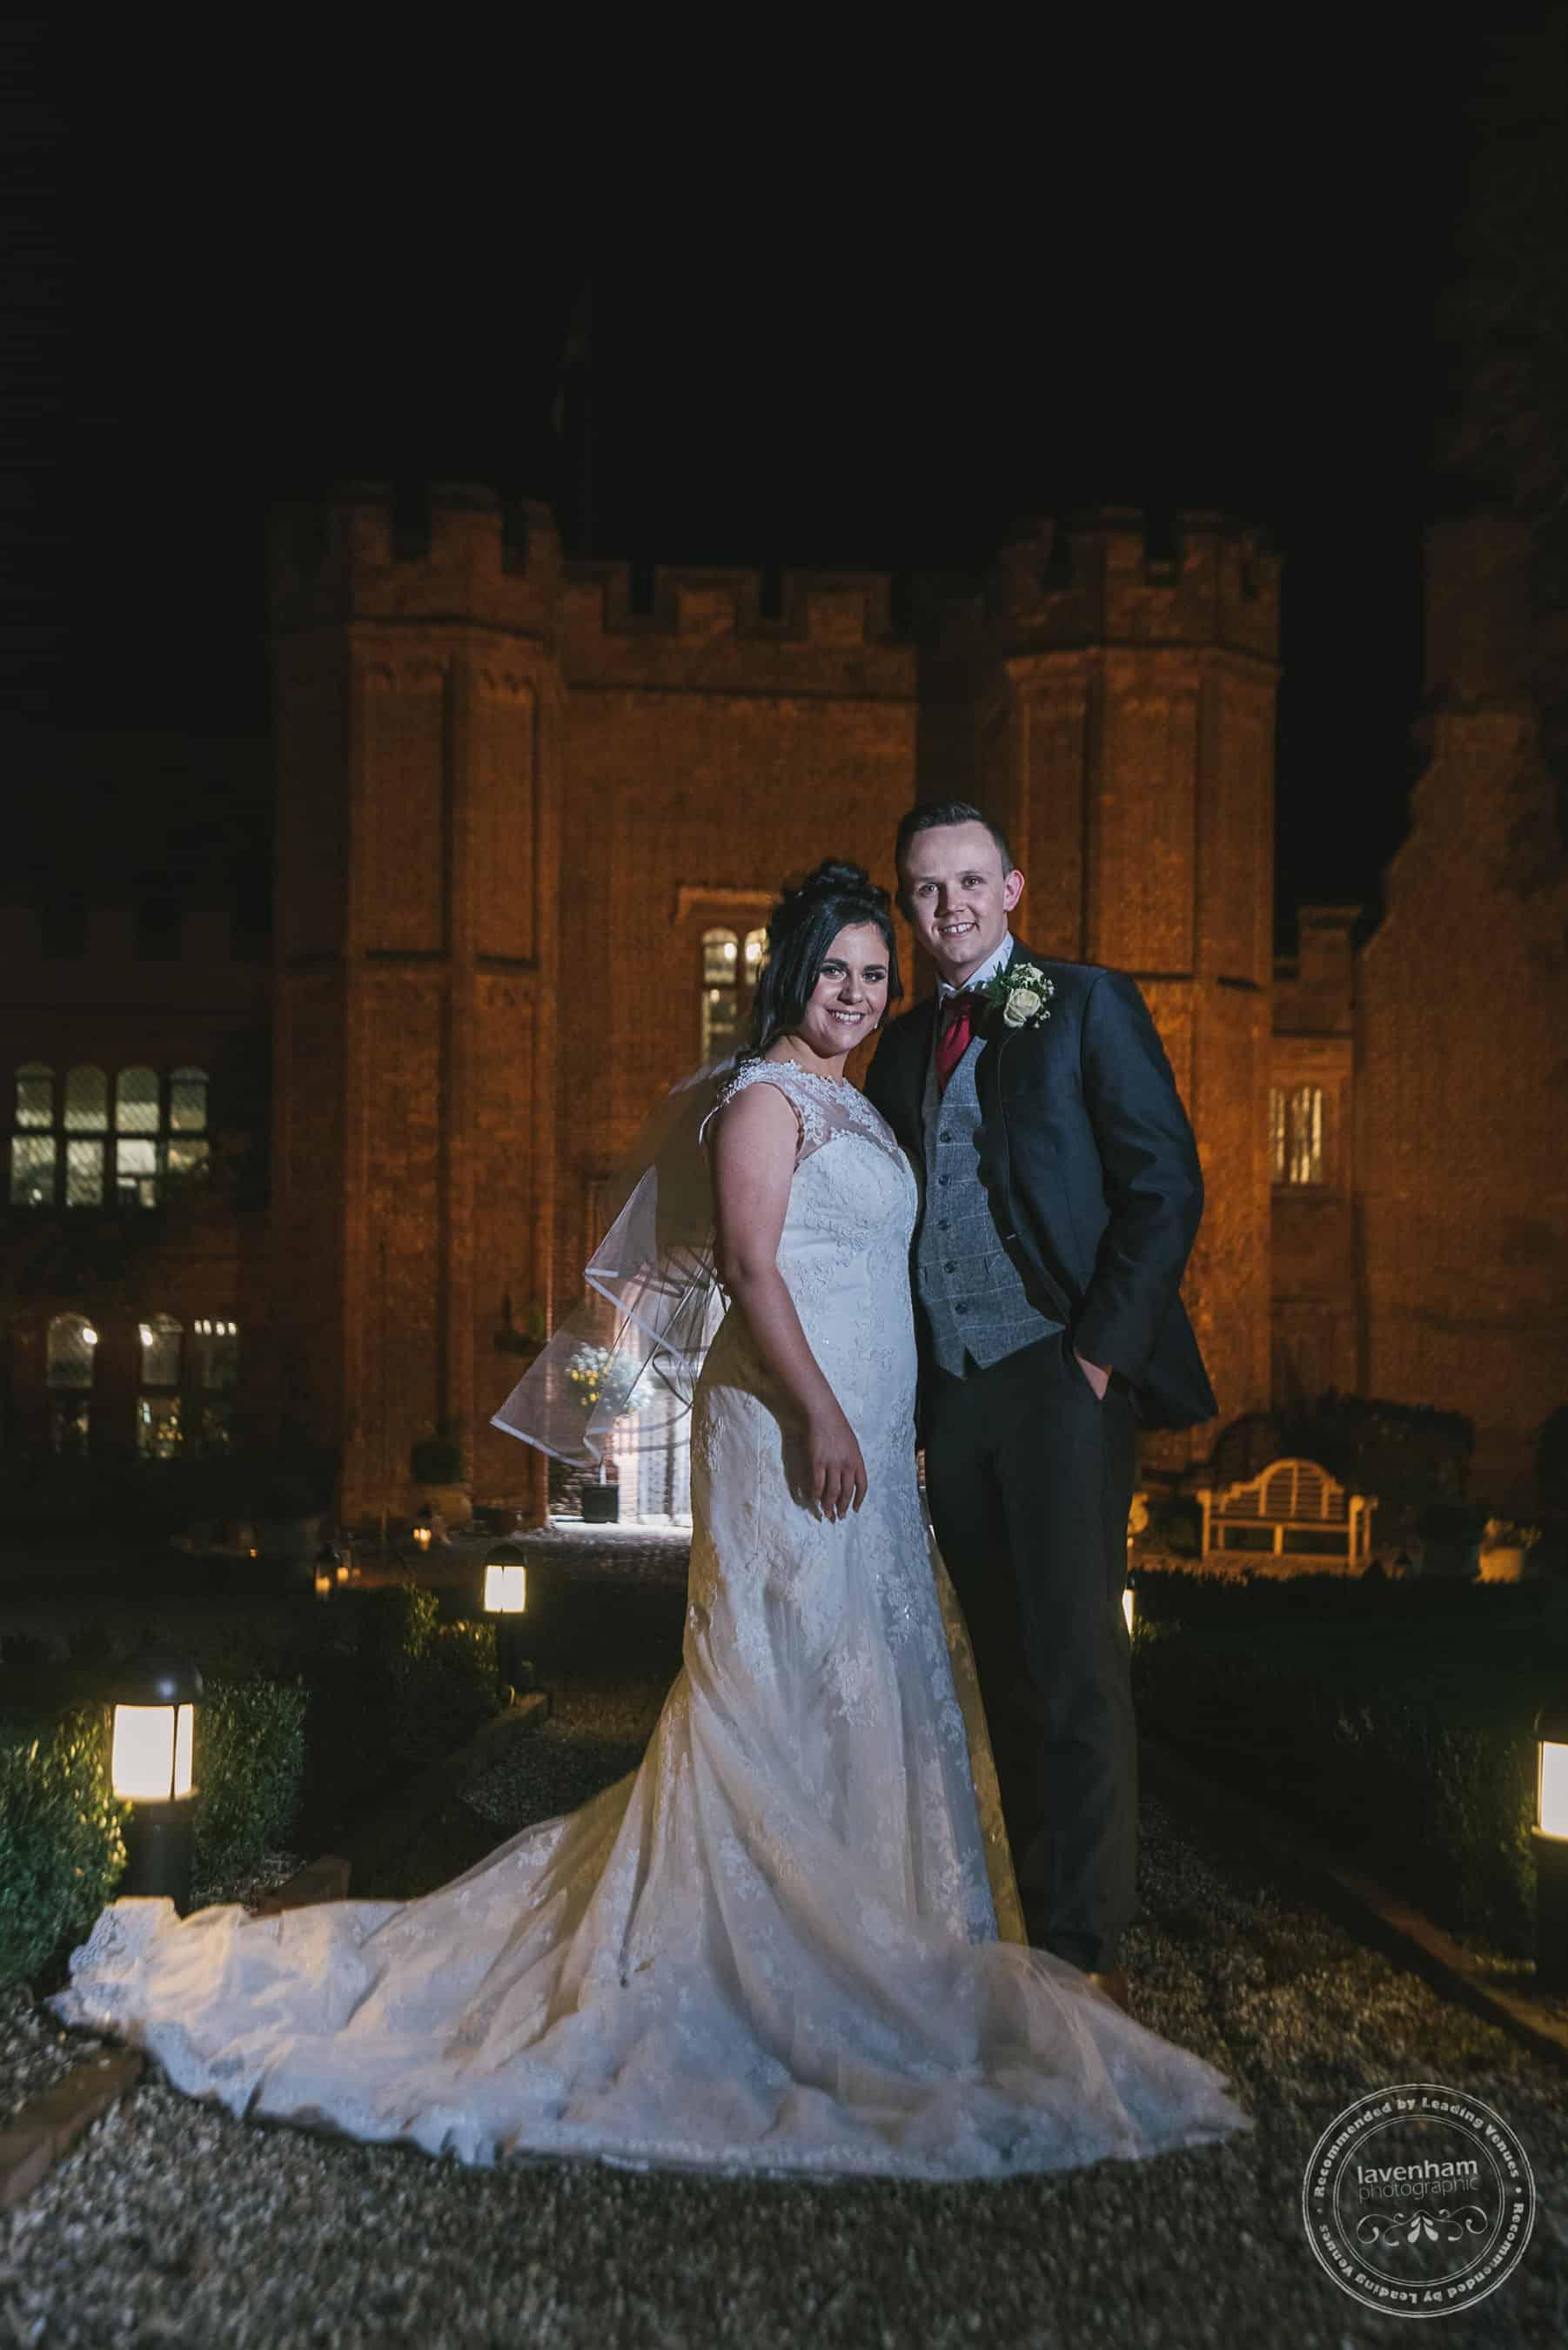 251118 Leez Priory Wedding Photography by Lavenham Photographic 110